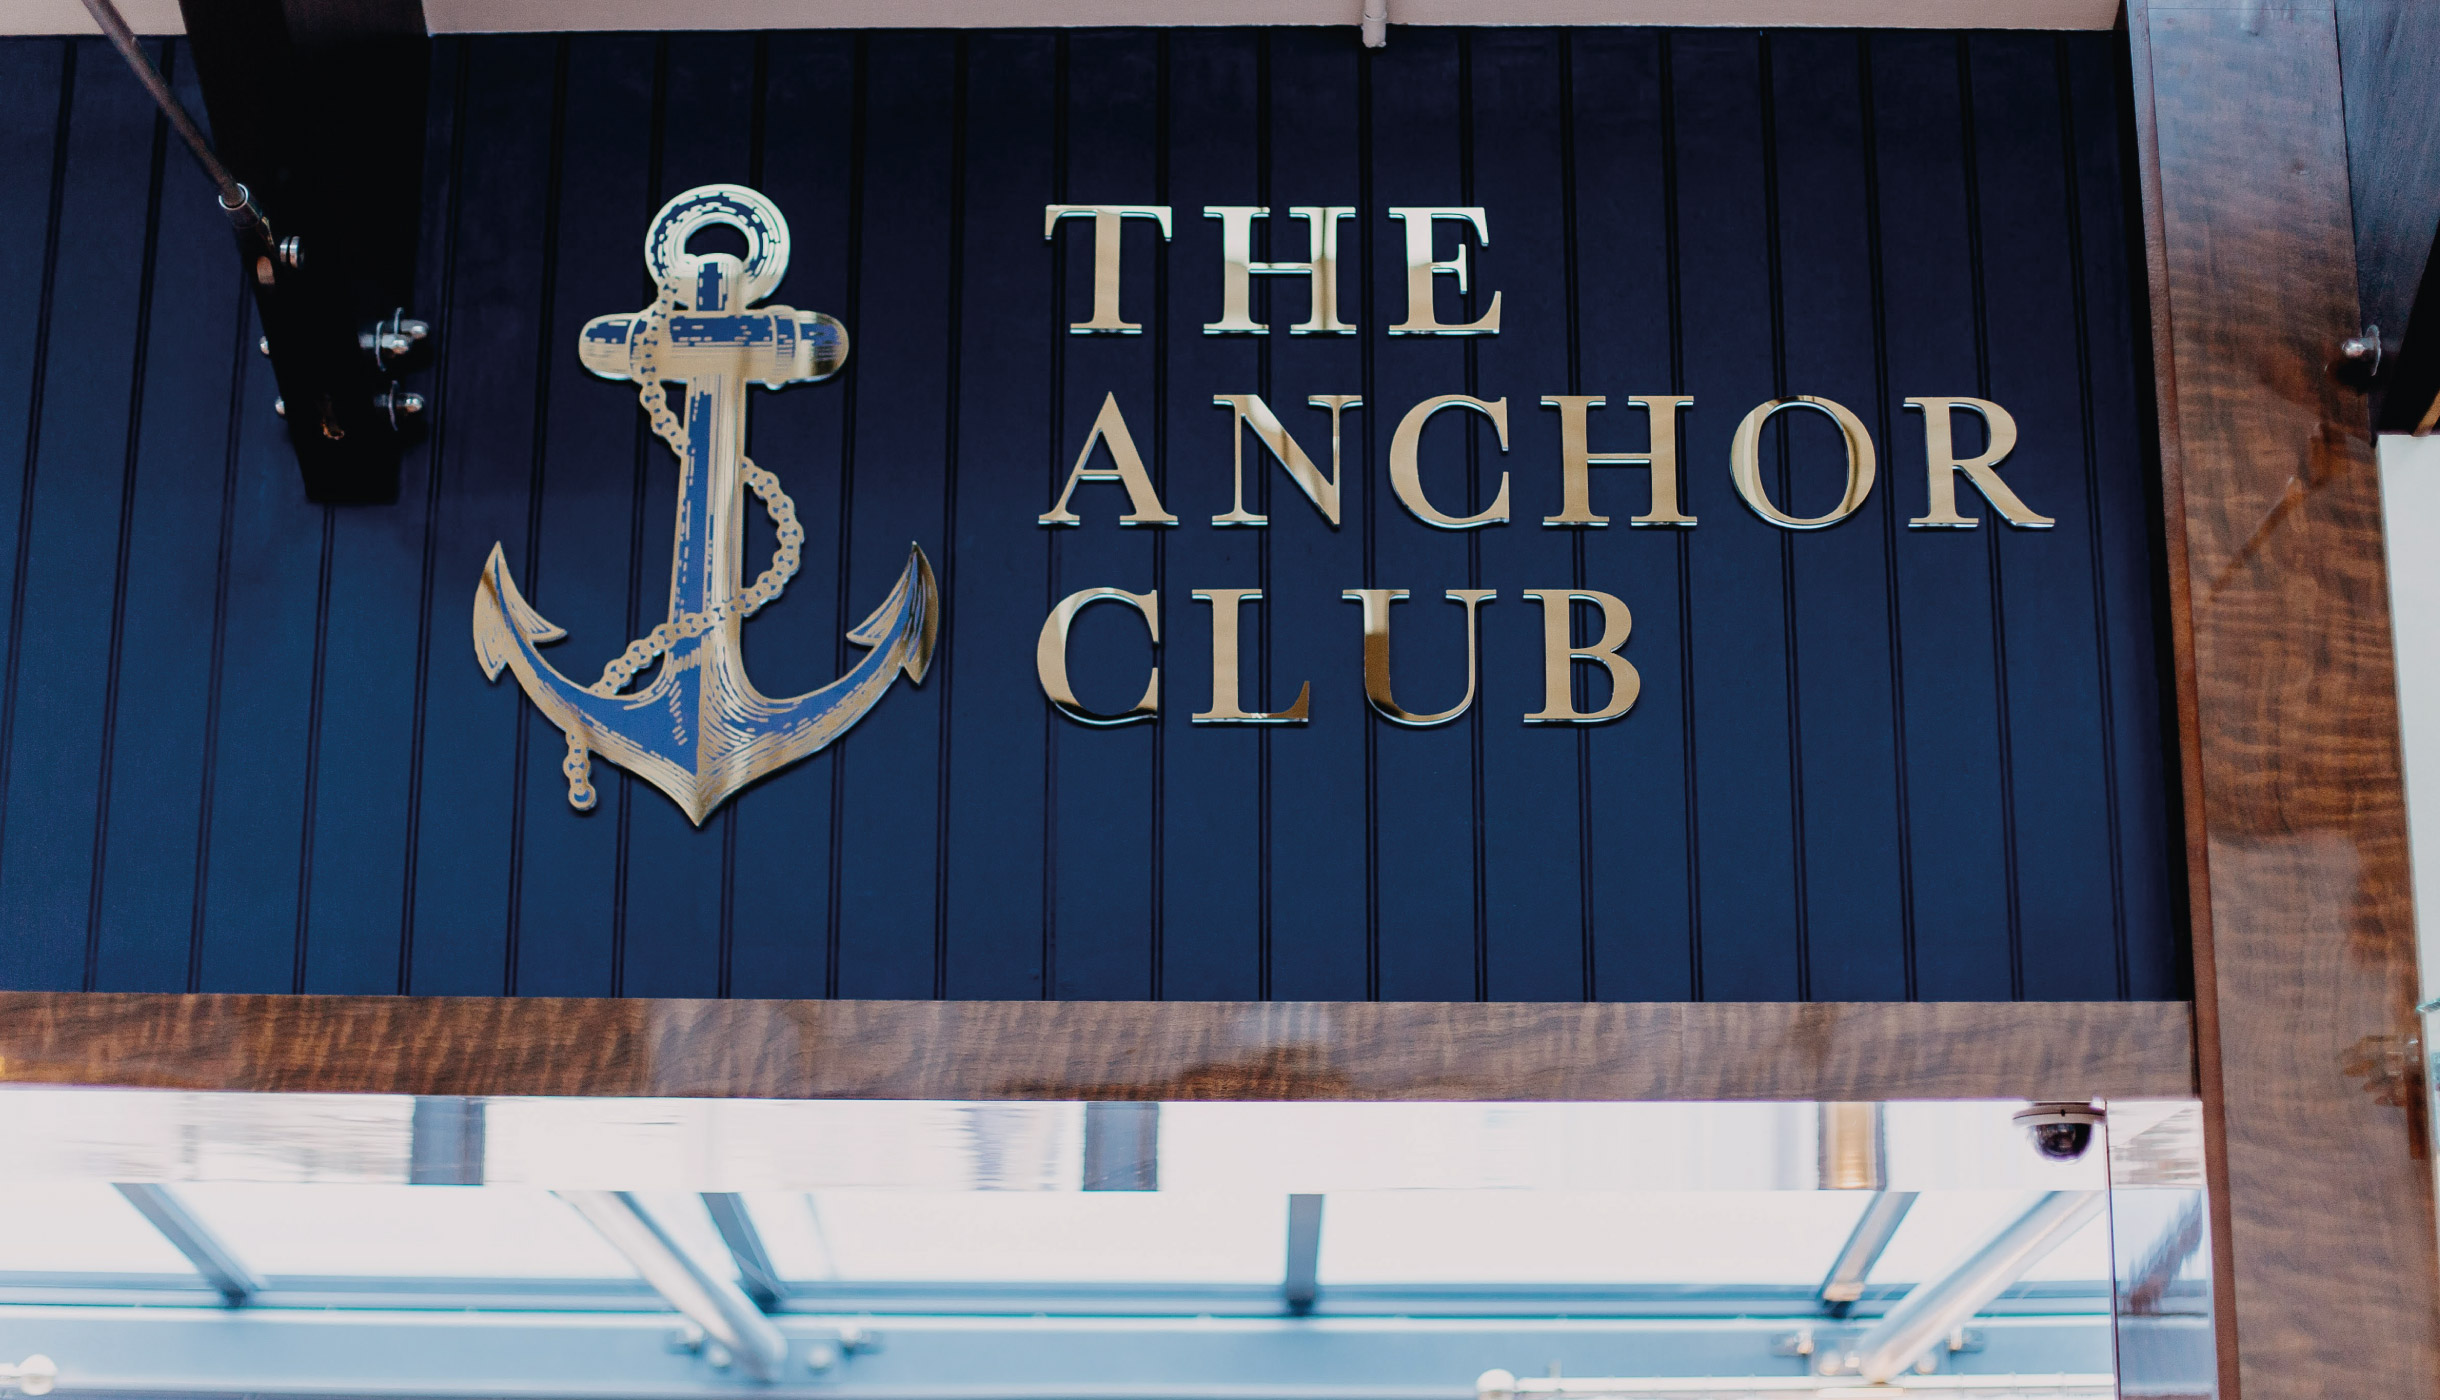 Quints Design co - The Anchor Club - Signage